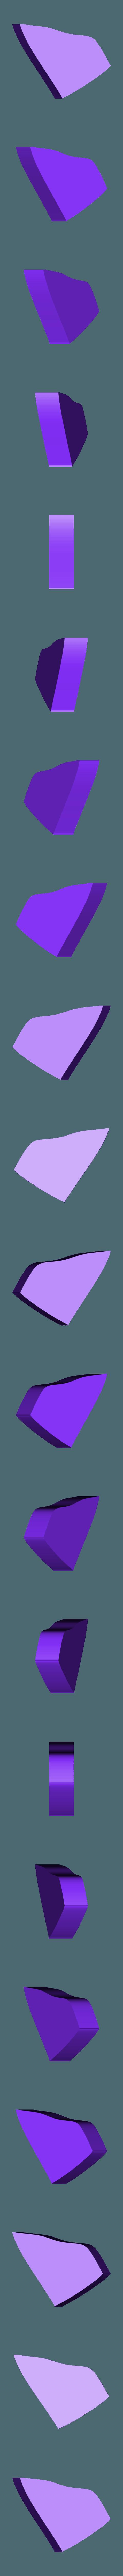 Bow1_Orange.stl Download free STL file Chicago Blackhawks Phone Stand • 3D printable template, stensethjeremy